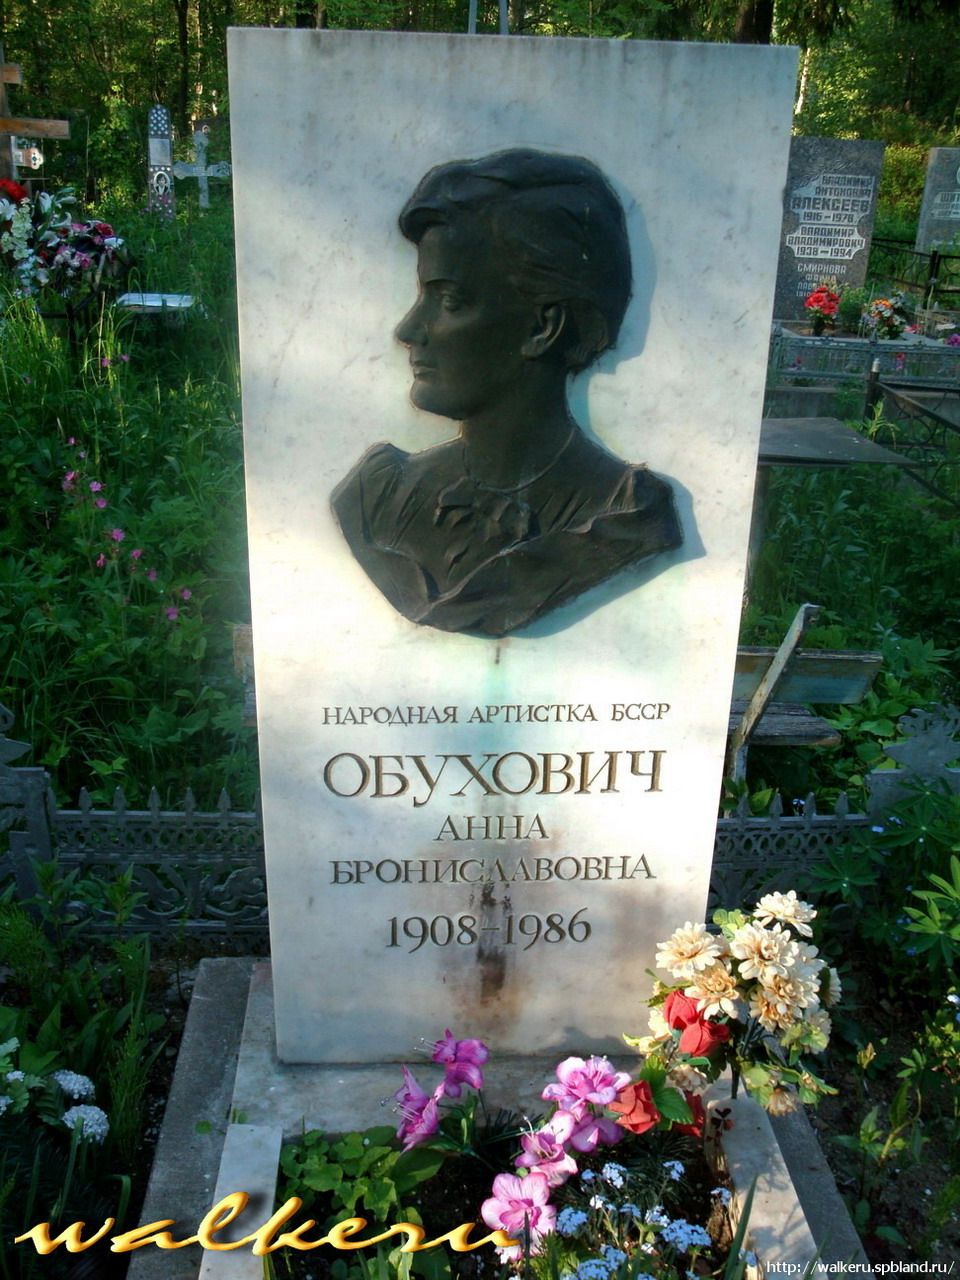 Могила ОБУХОВИЧ А.Б. на Северном кладбище